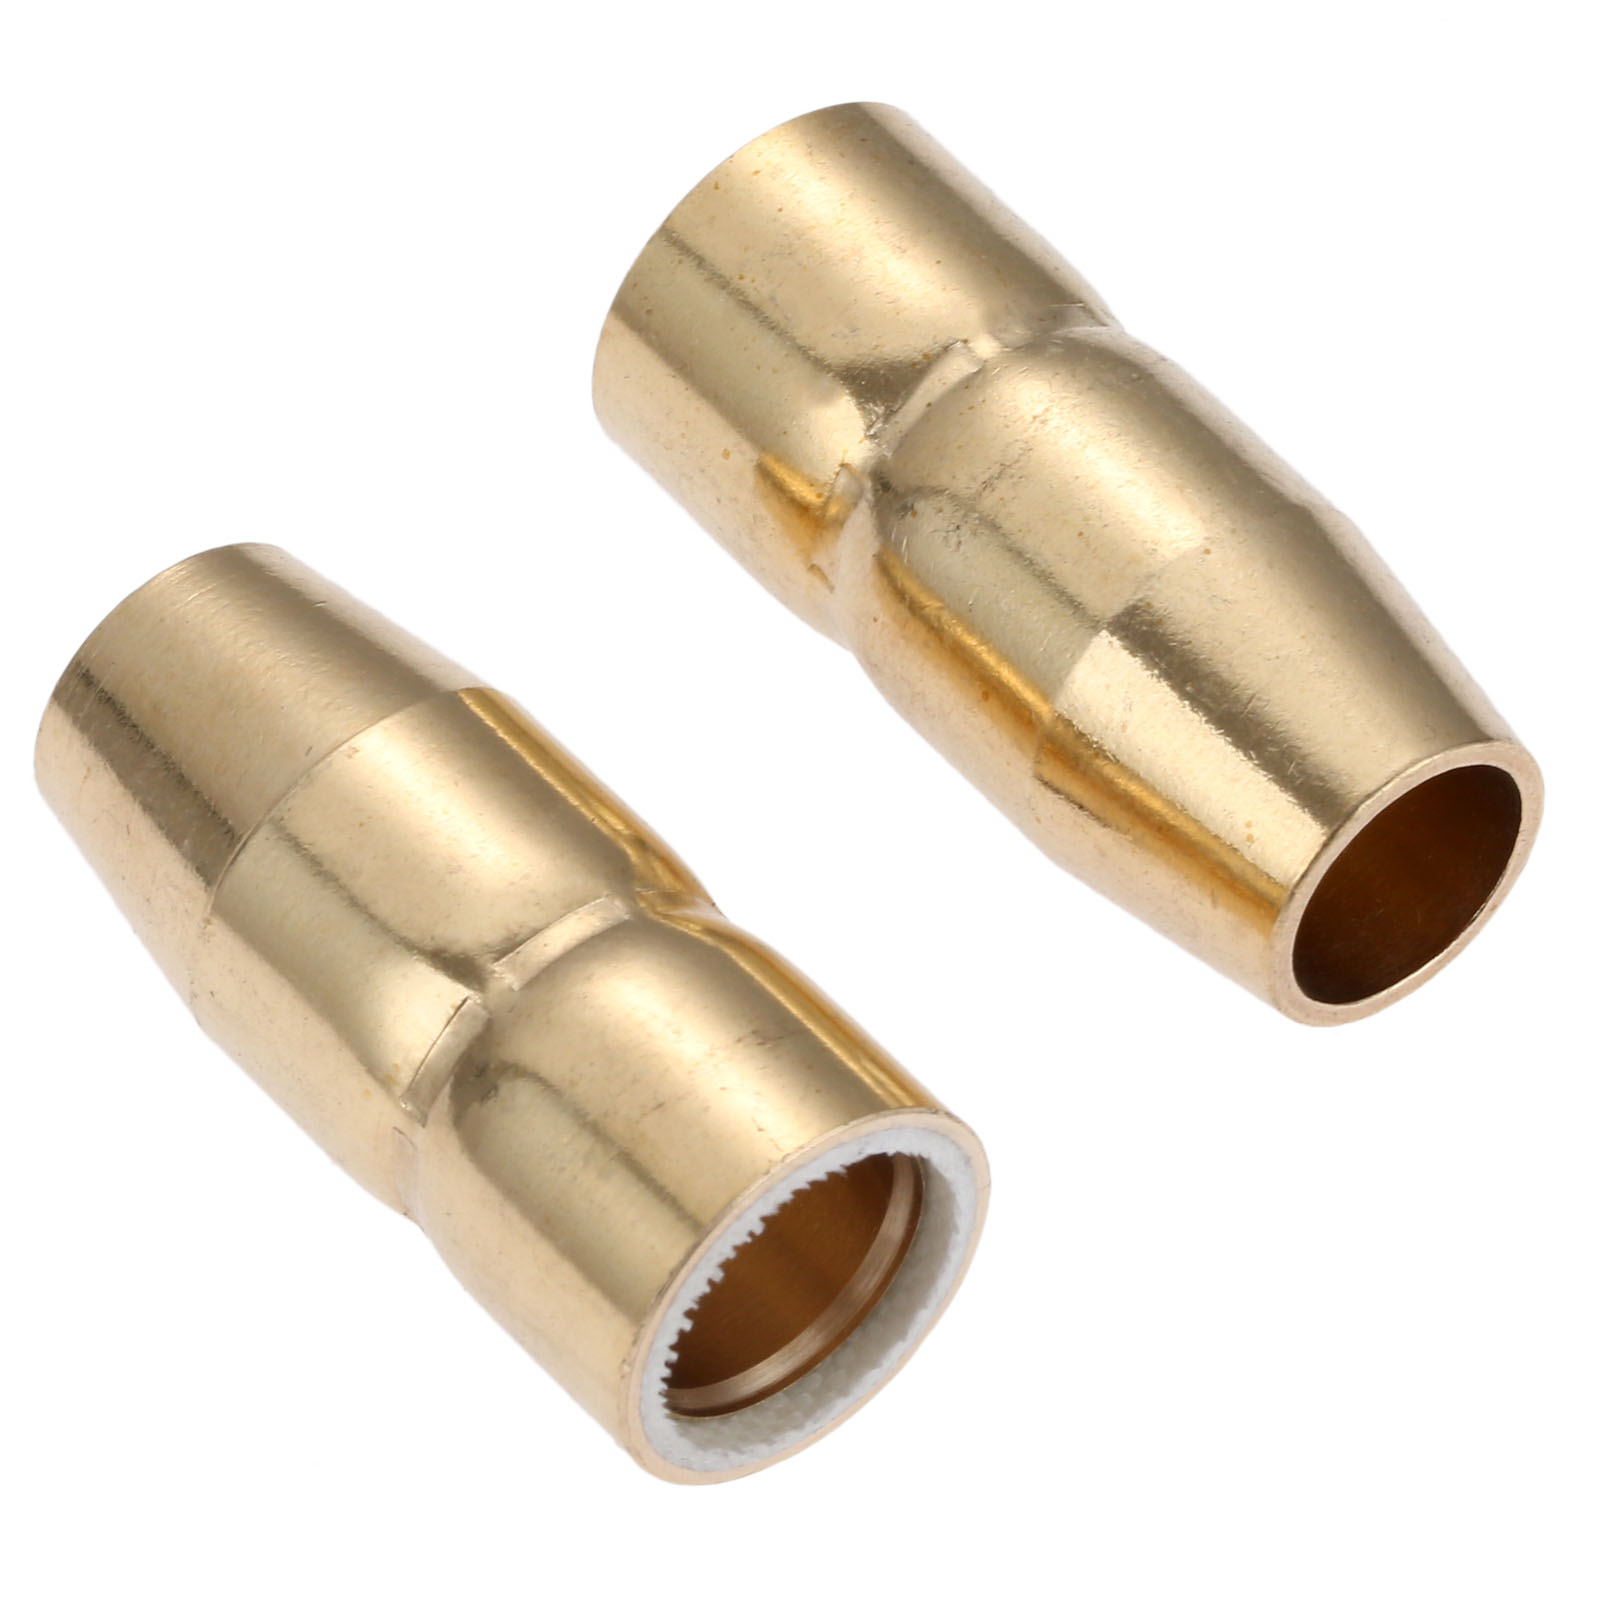 ACCEPTIN 10Pcs 220930 fit Plasma Nozzles Torch Tips Cutting Consumables 65//85//105A consumables 10pk